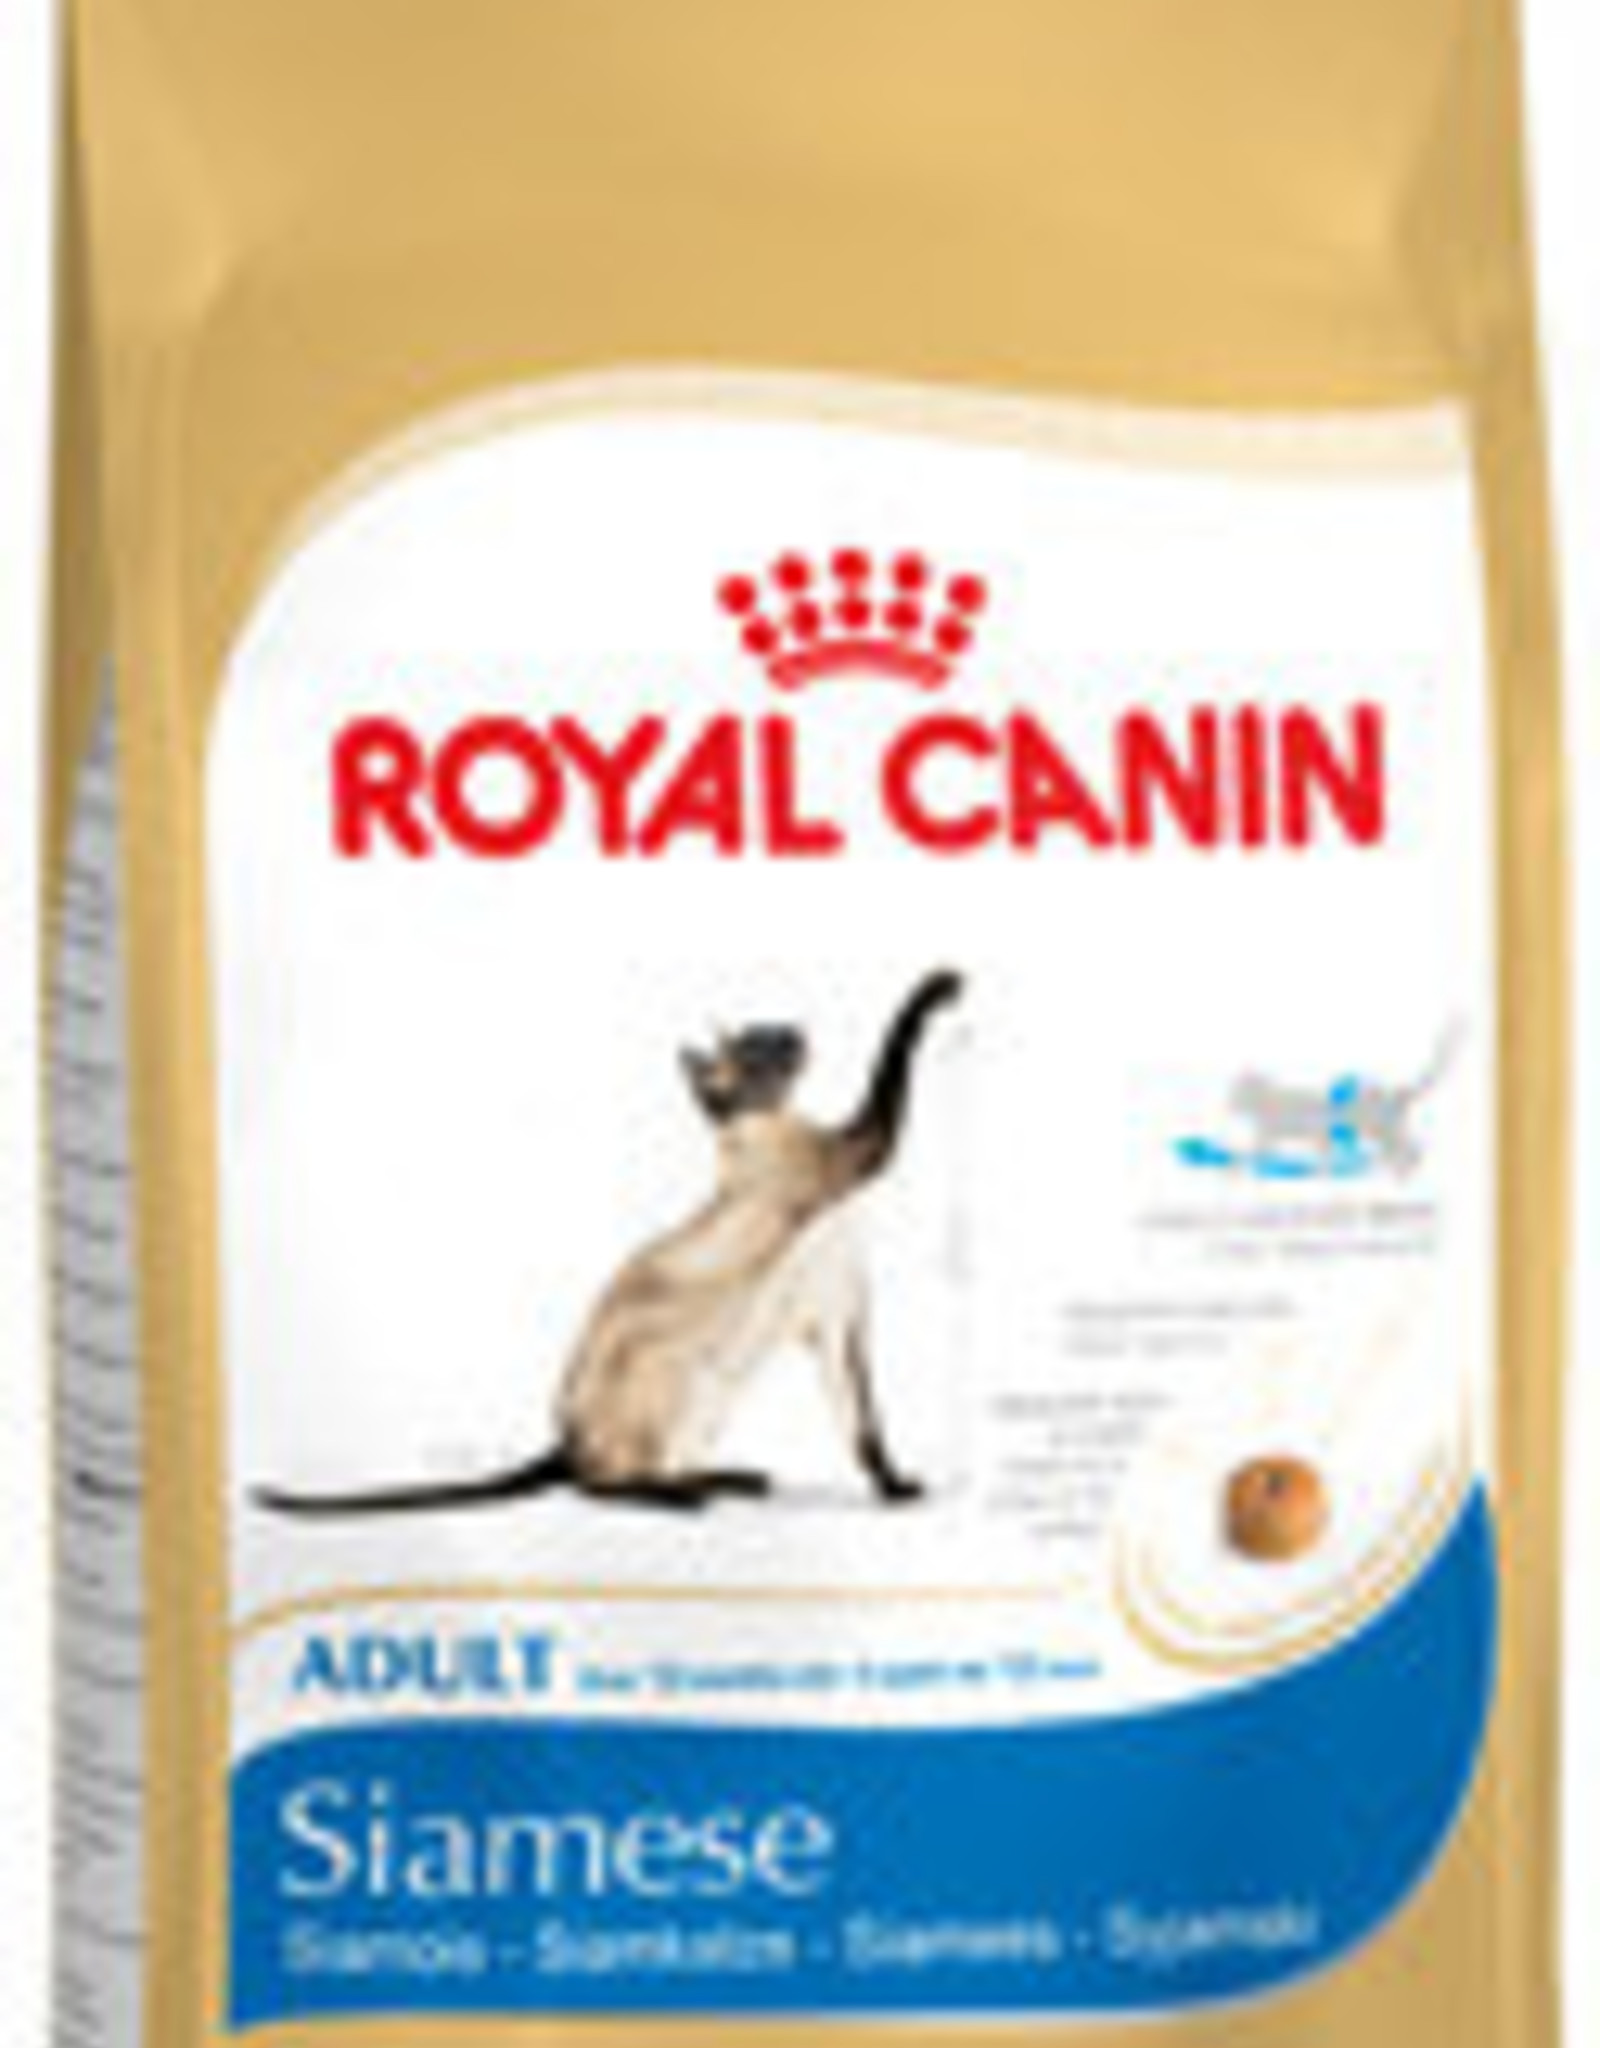 Royal Canin Royal Canin Fbn Siamese 38 4kg